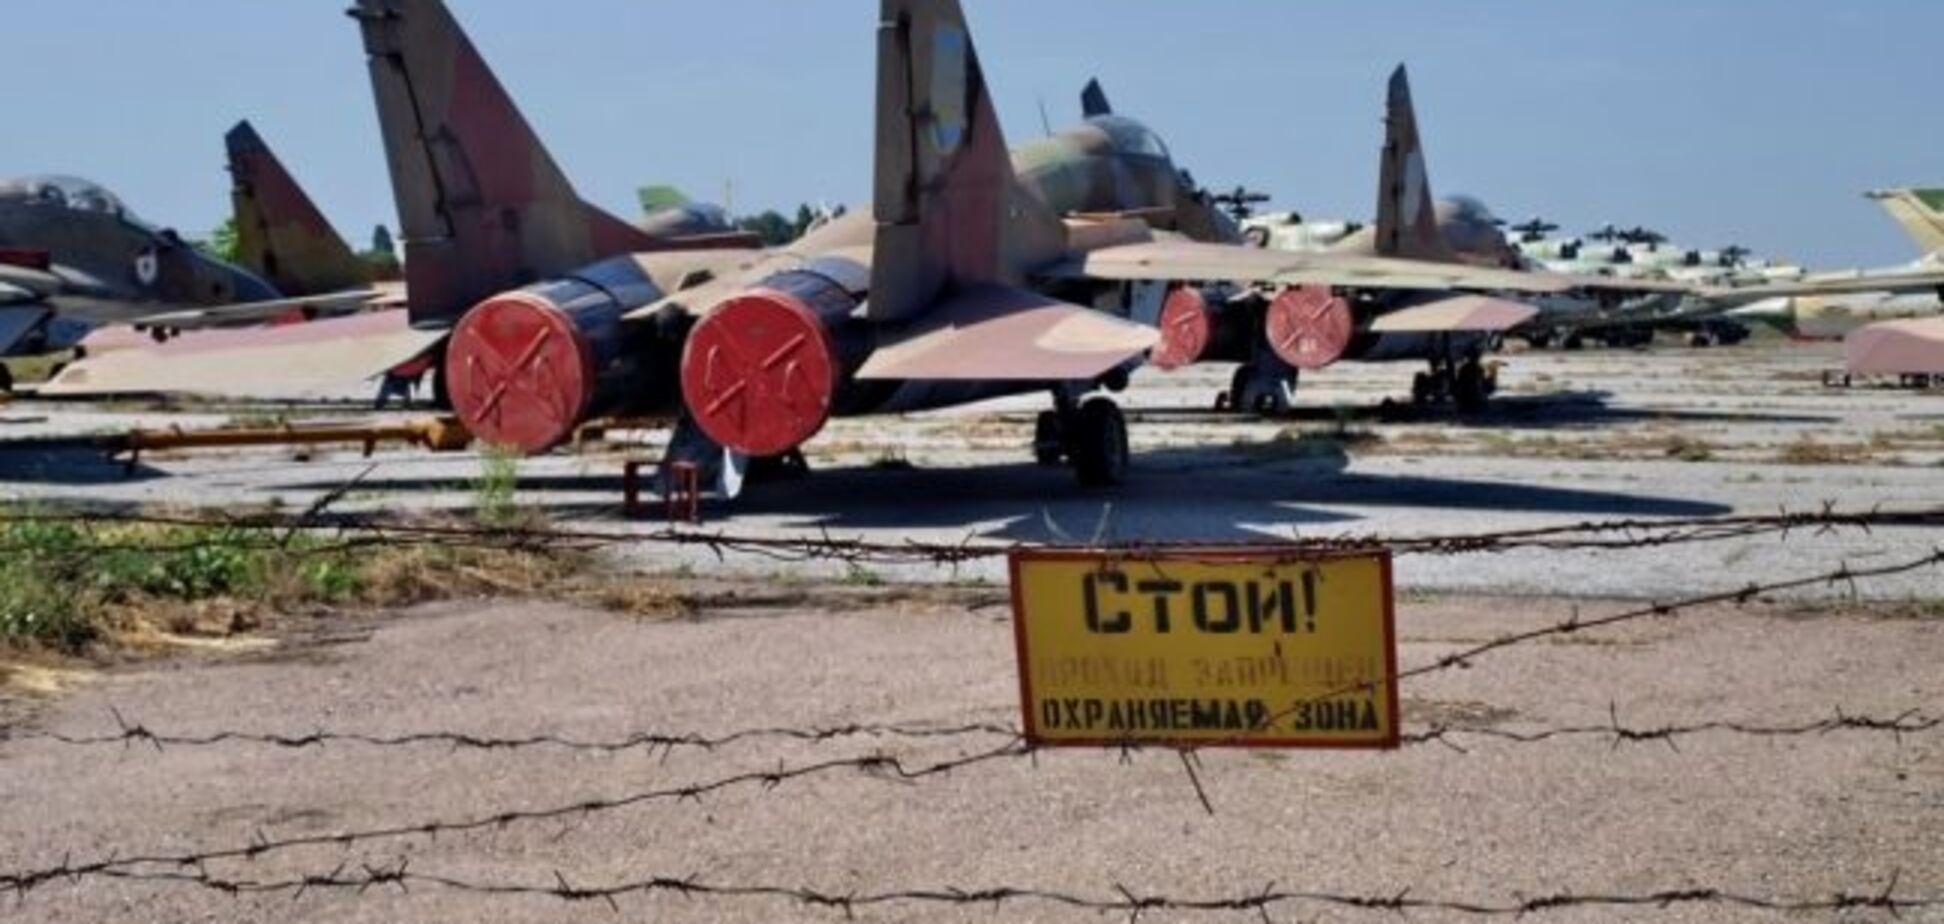 Захват аэродрома в Одессе: суд арестовал командира военной части